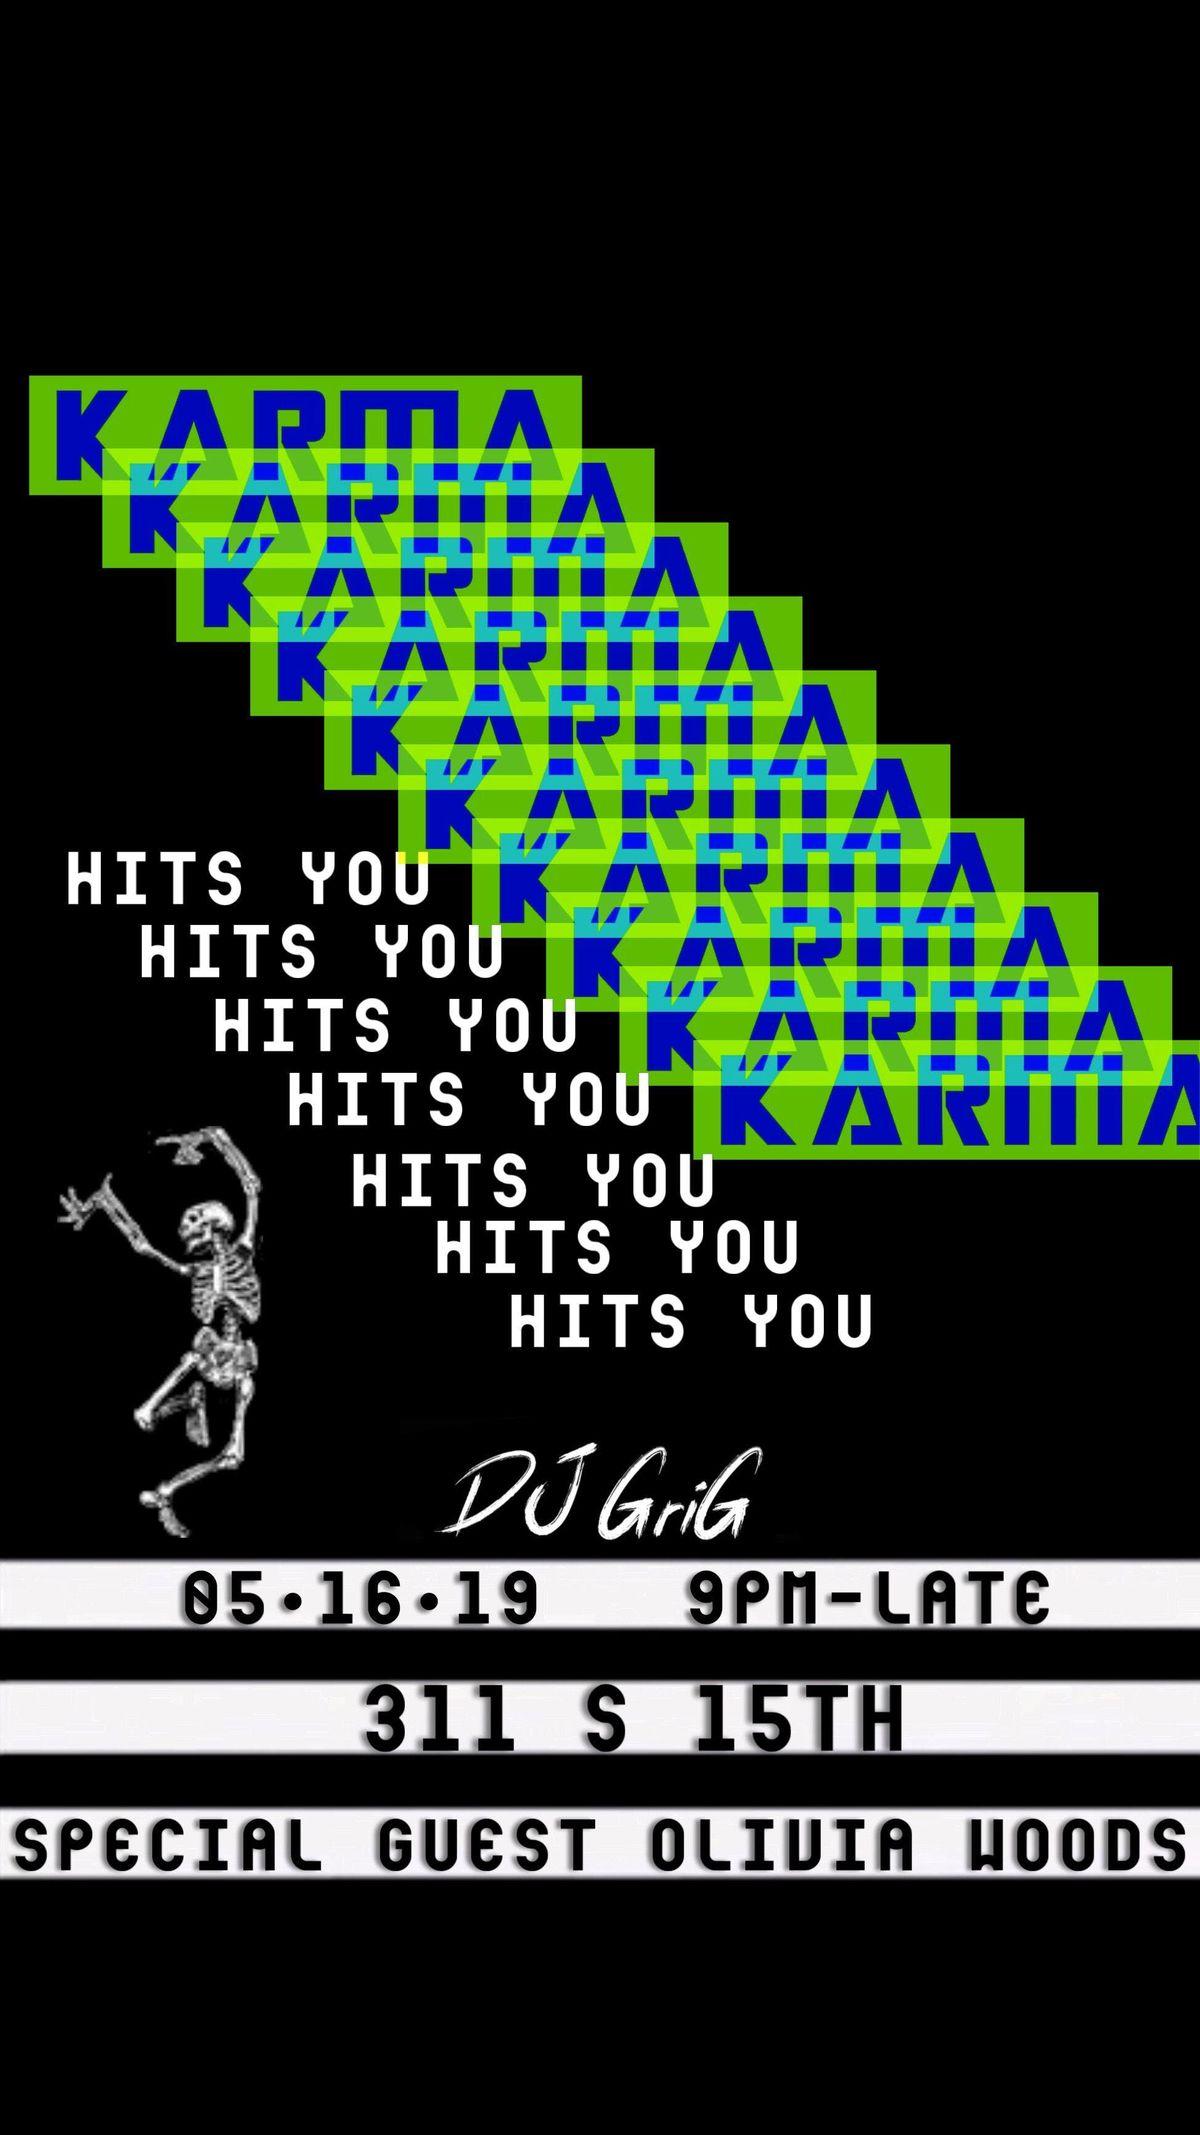 Karma Hits You Omaha